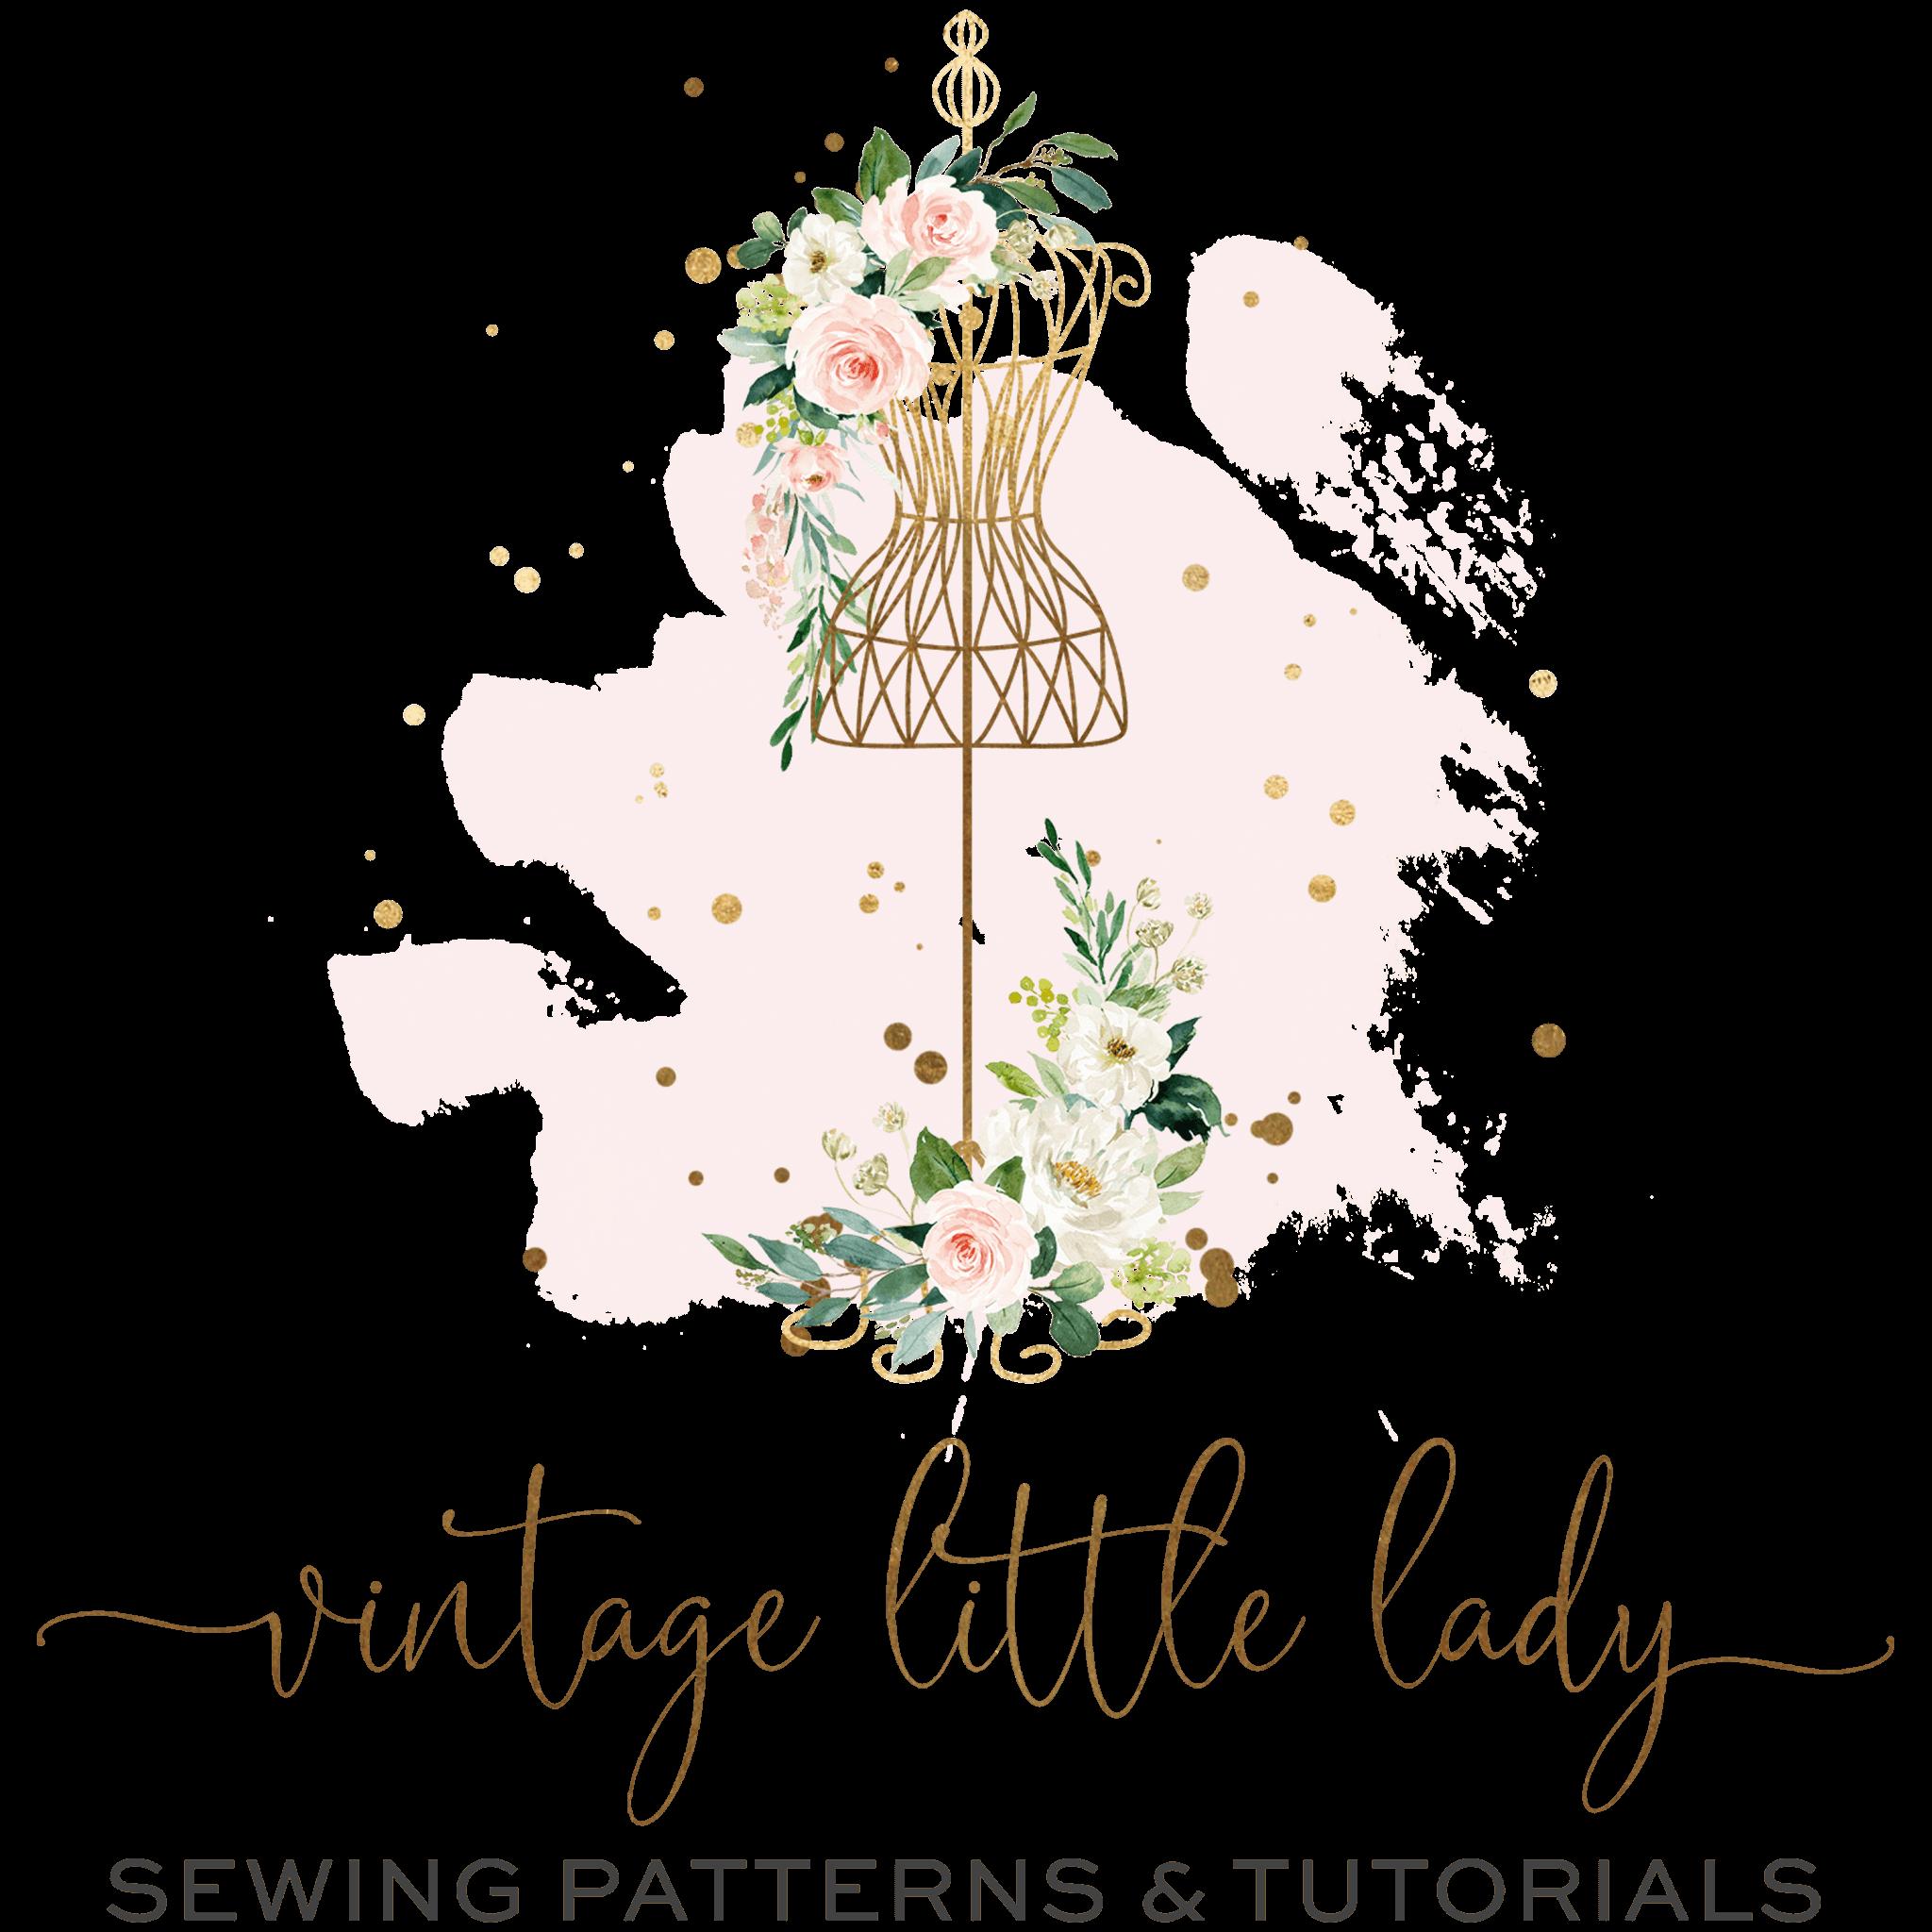 Vintage Little Lady logo